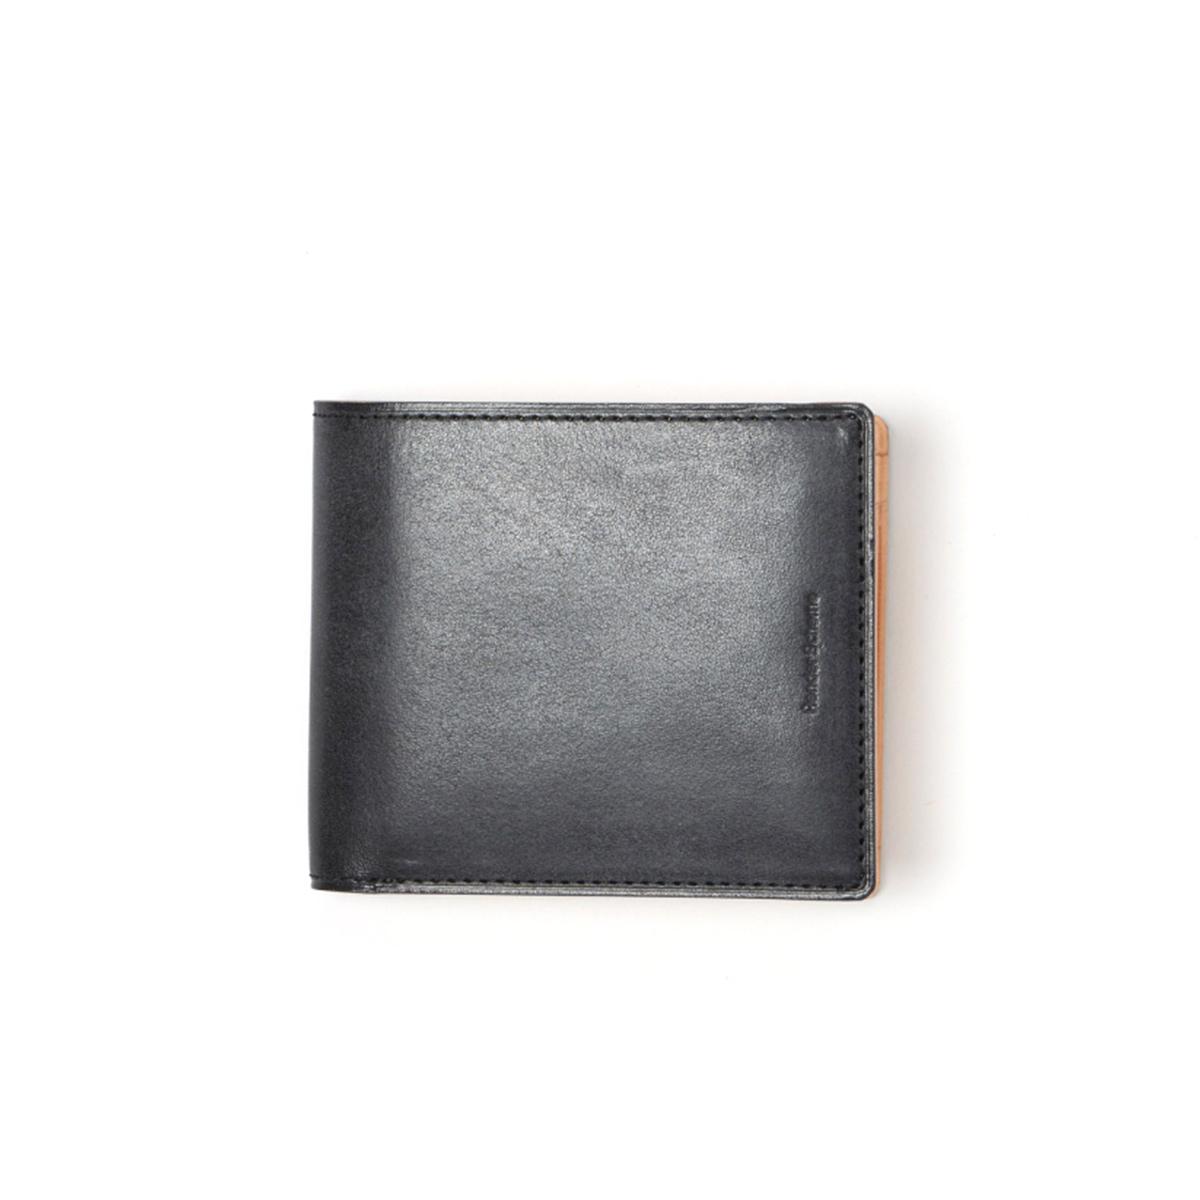 Hender Scheme / half folded wallet -Black